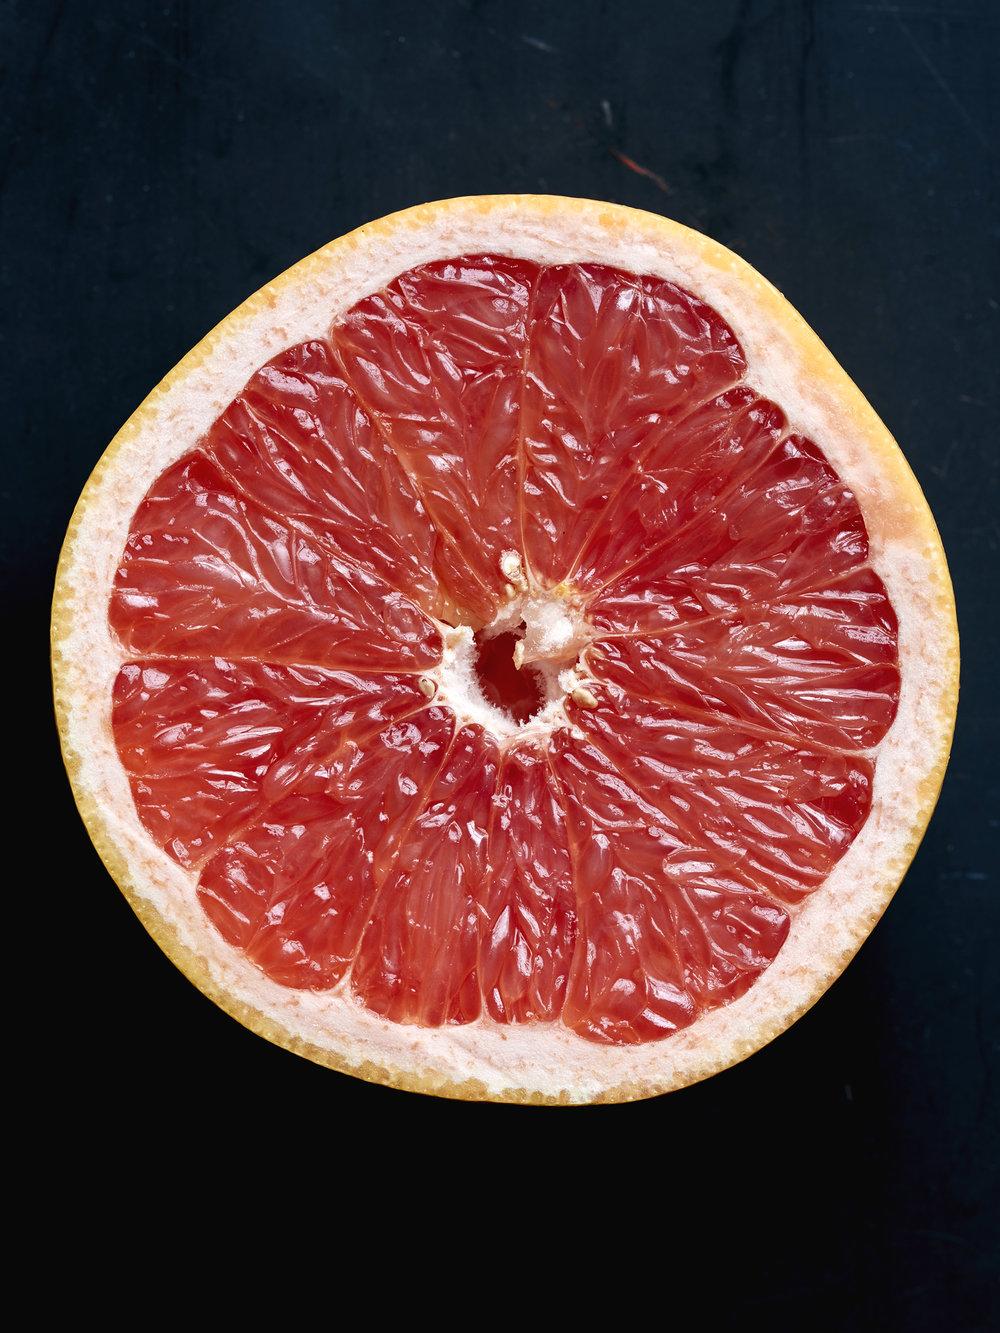 0216_Citrus_Grapefruit_074 copy.jpg